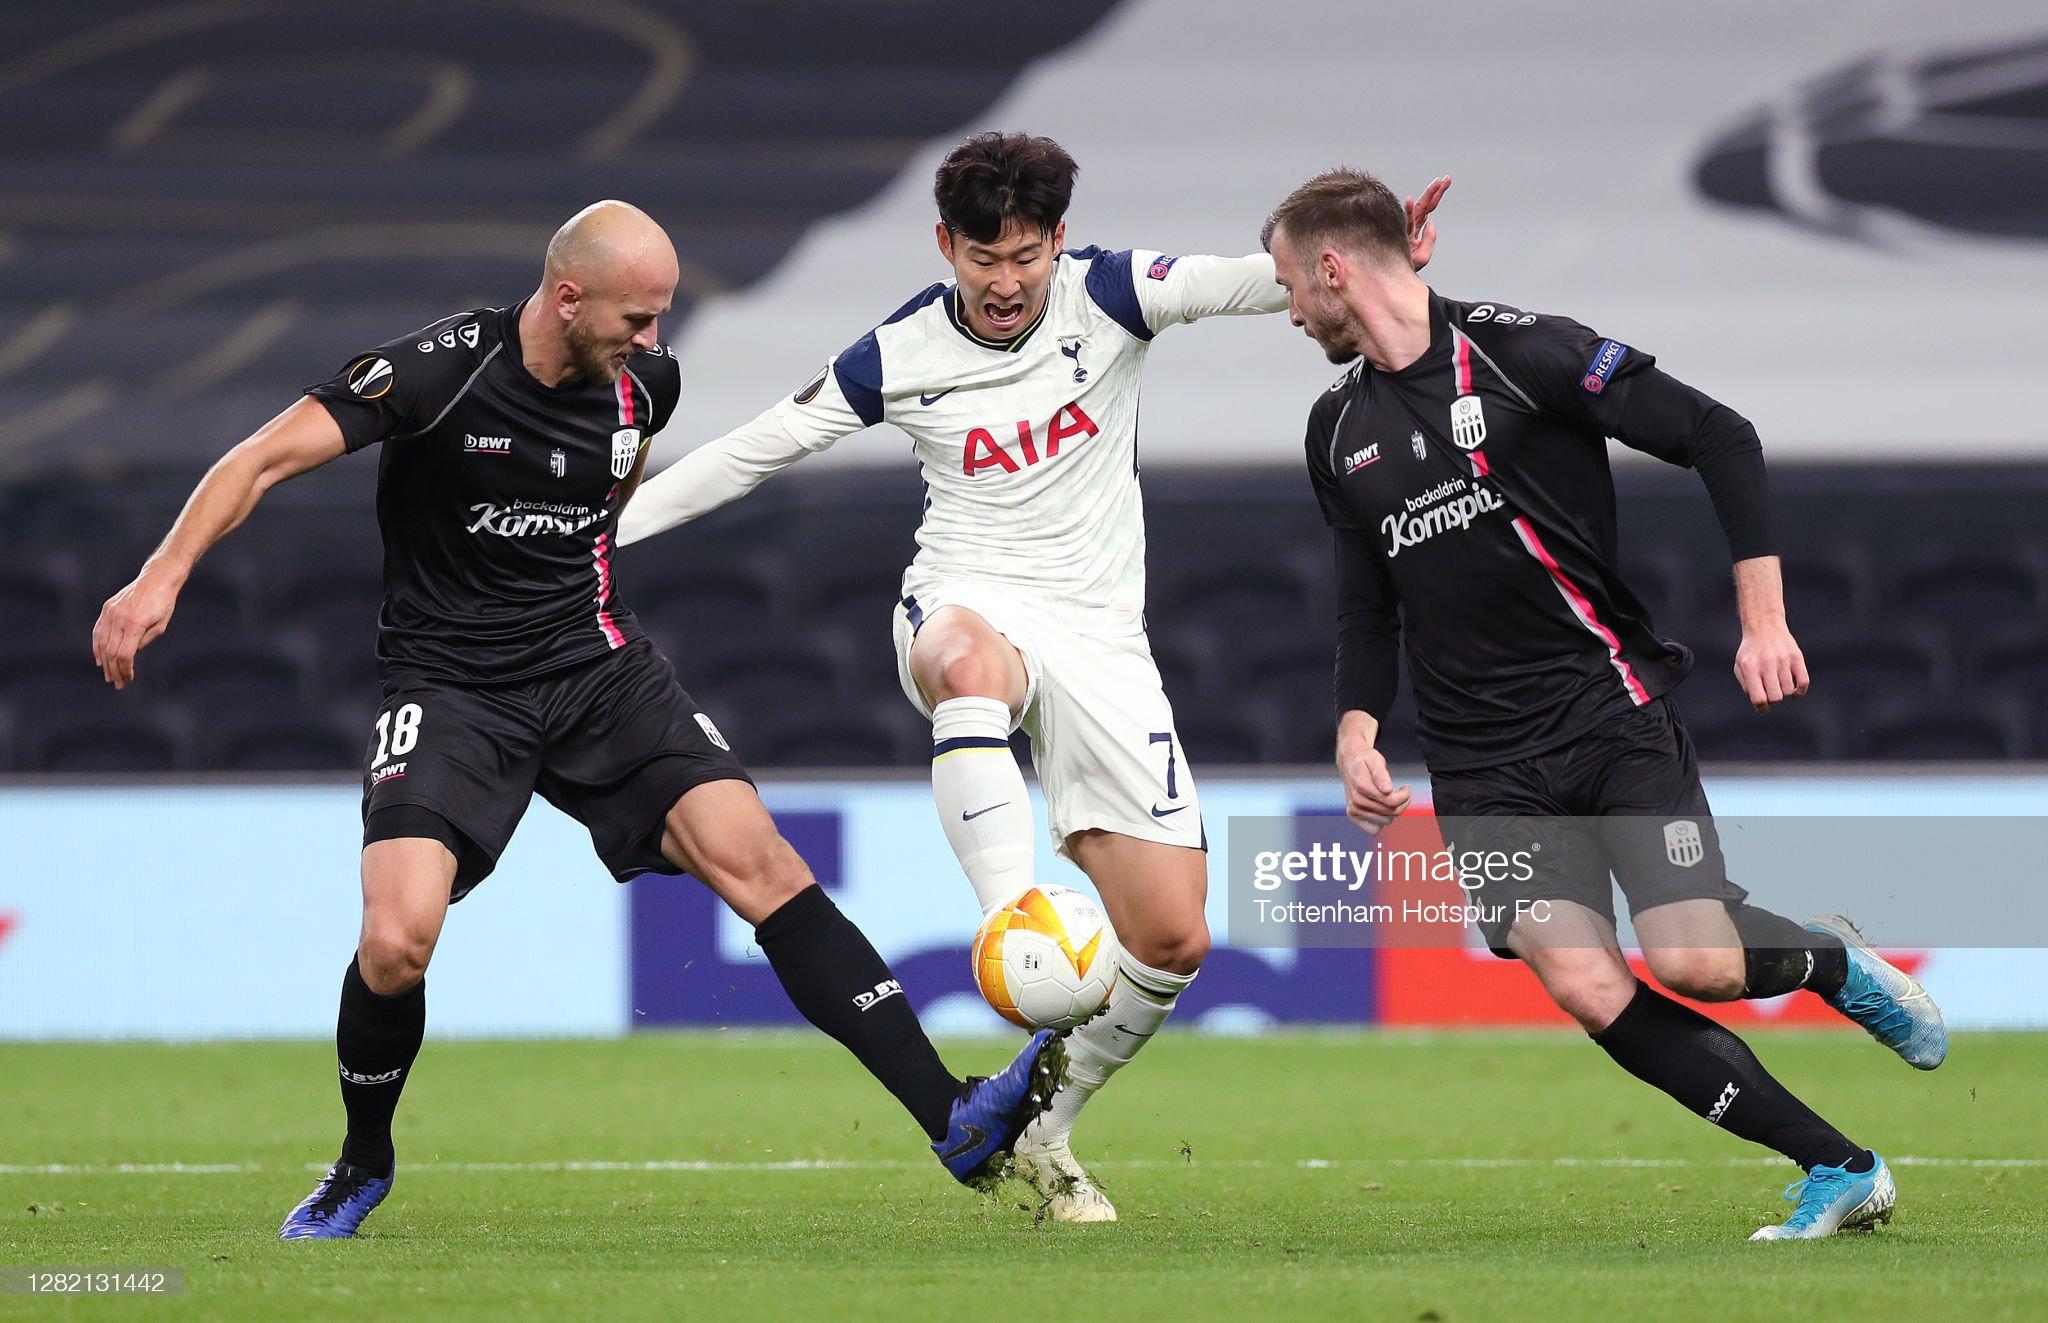 LASK vs Tottenham Preview, prediction and odds